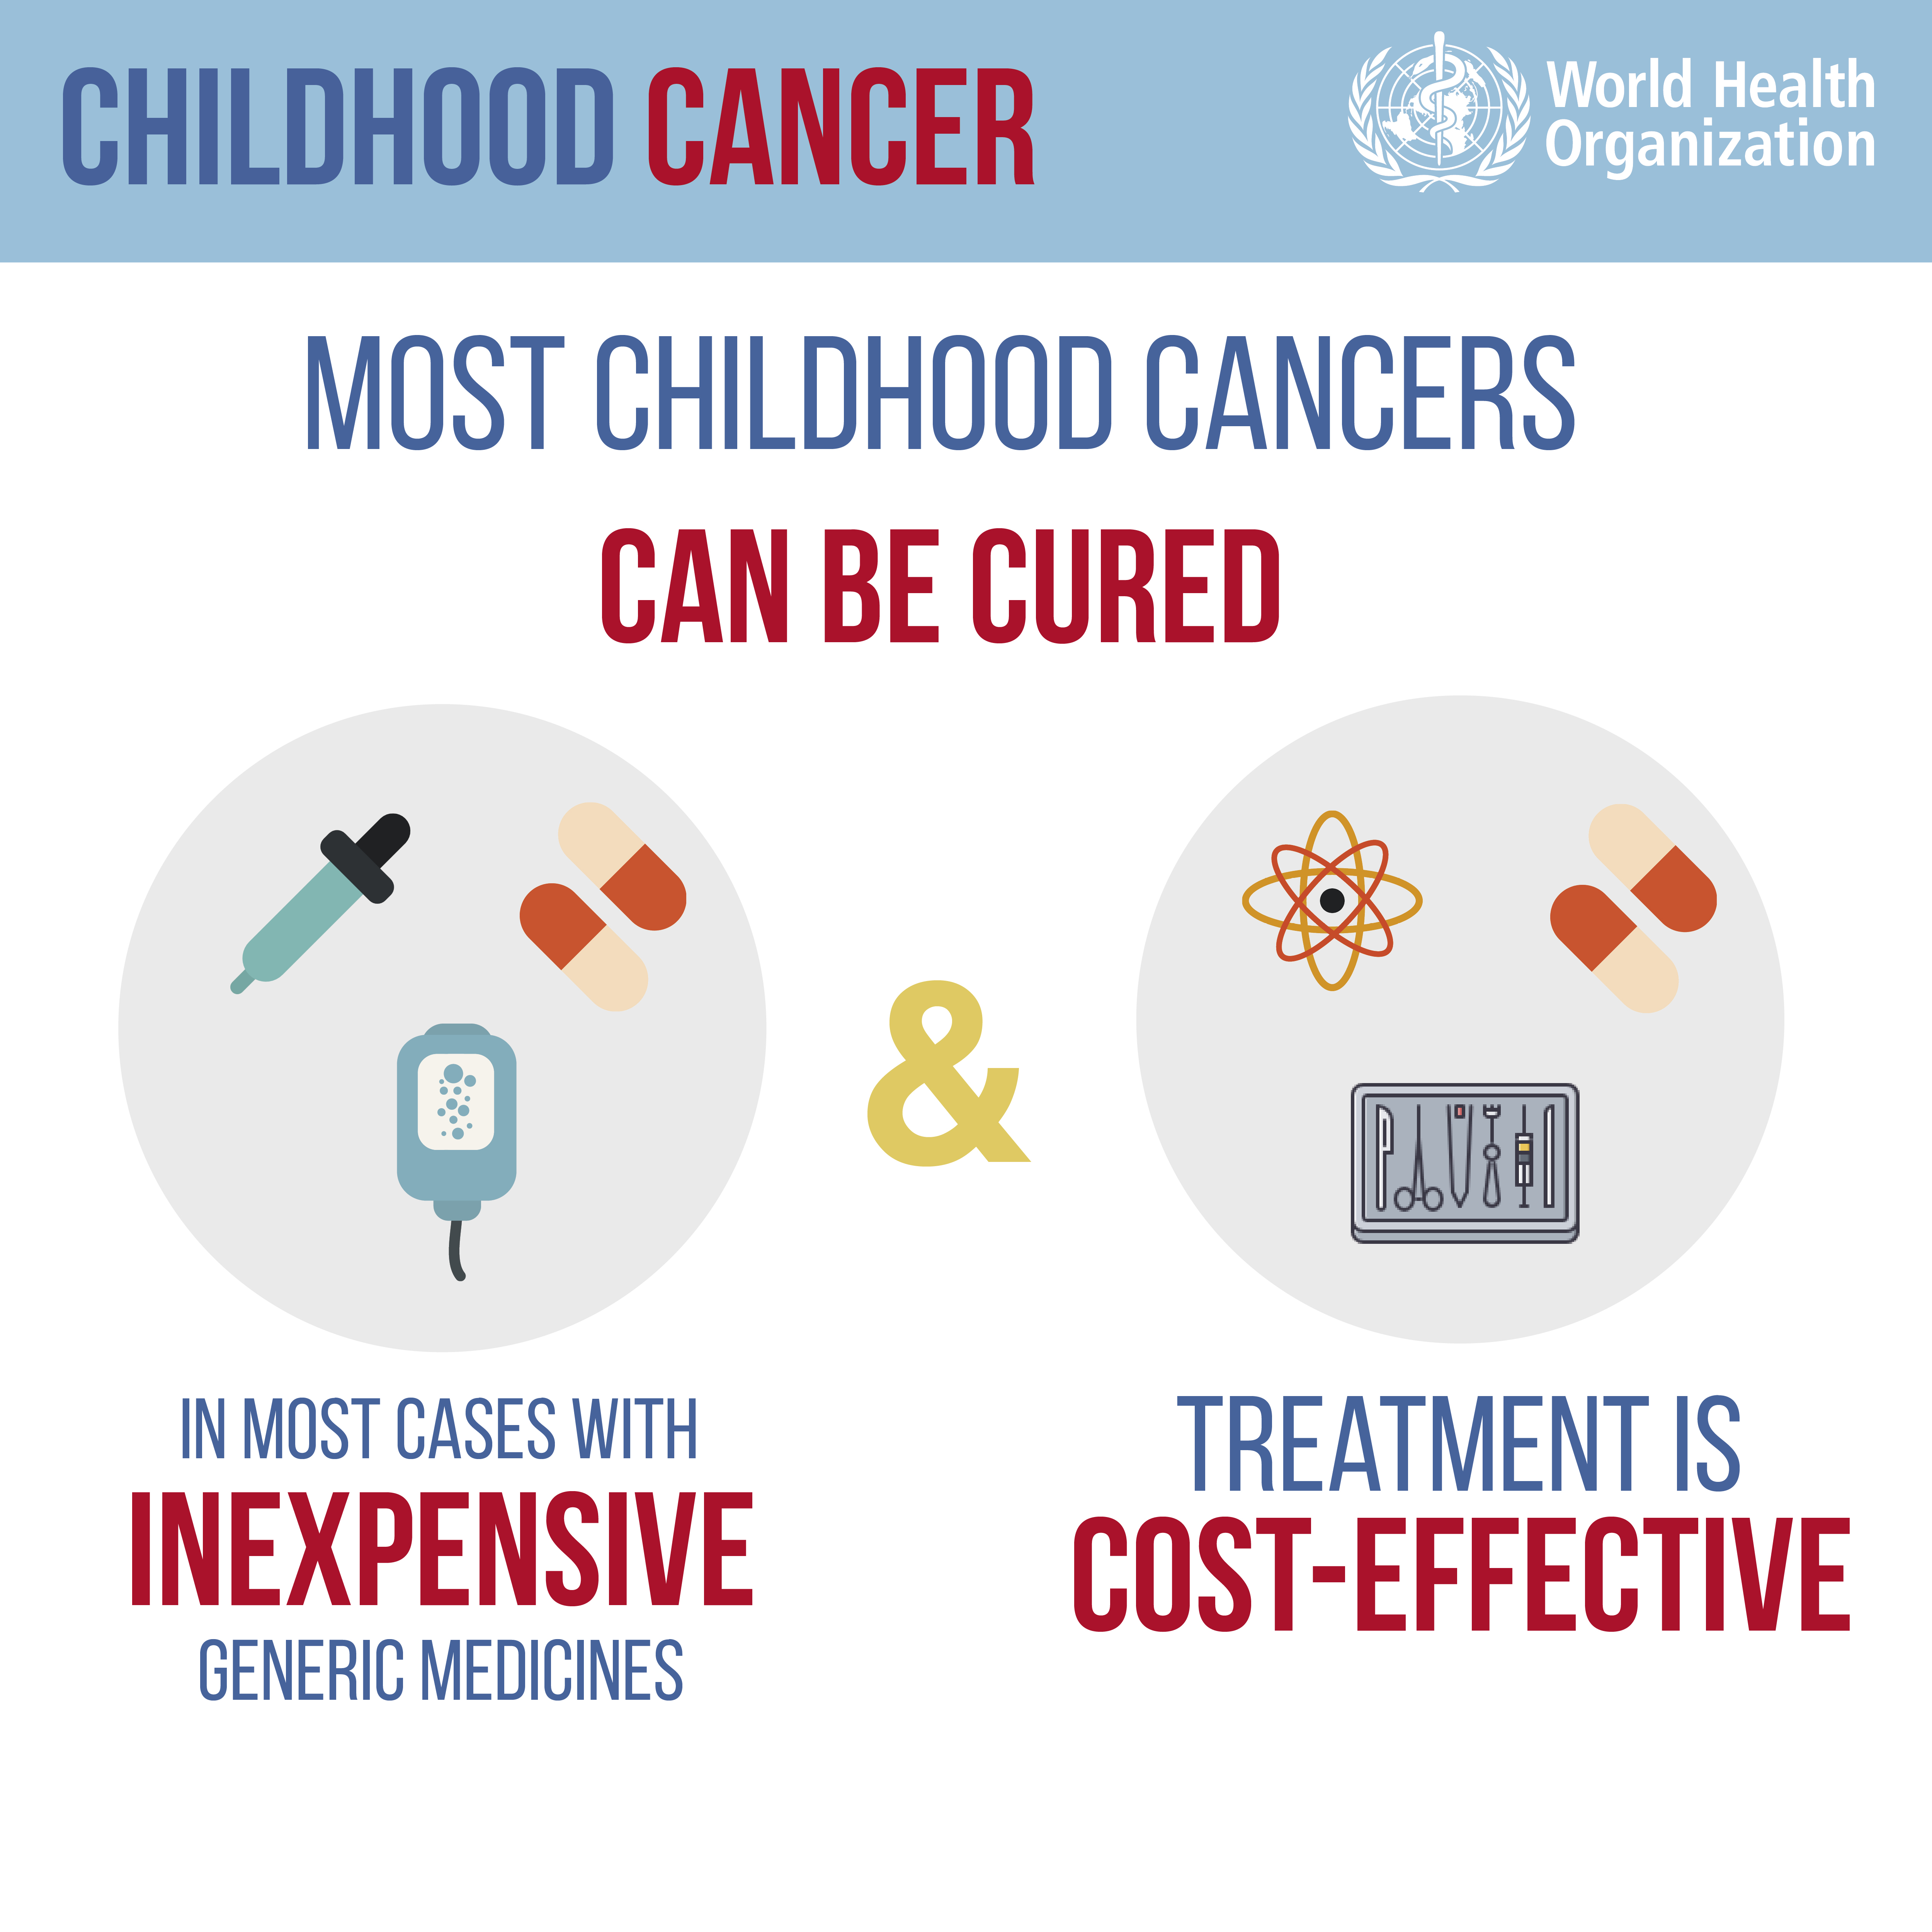 human papillomavirus and related cancers fact sheet 2019)